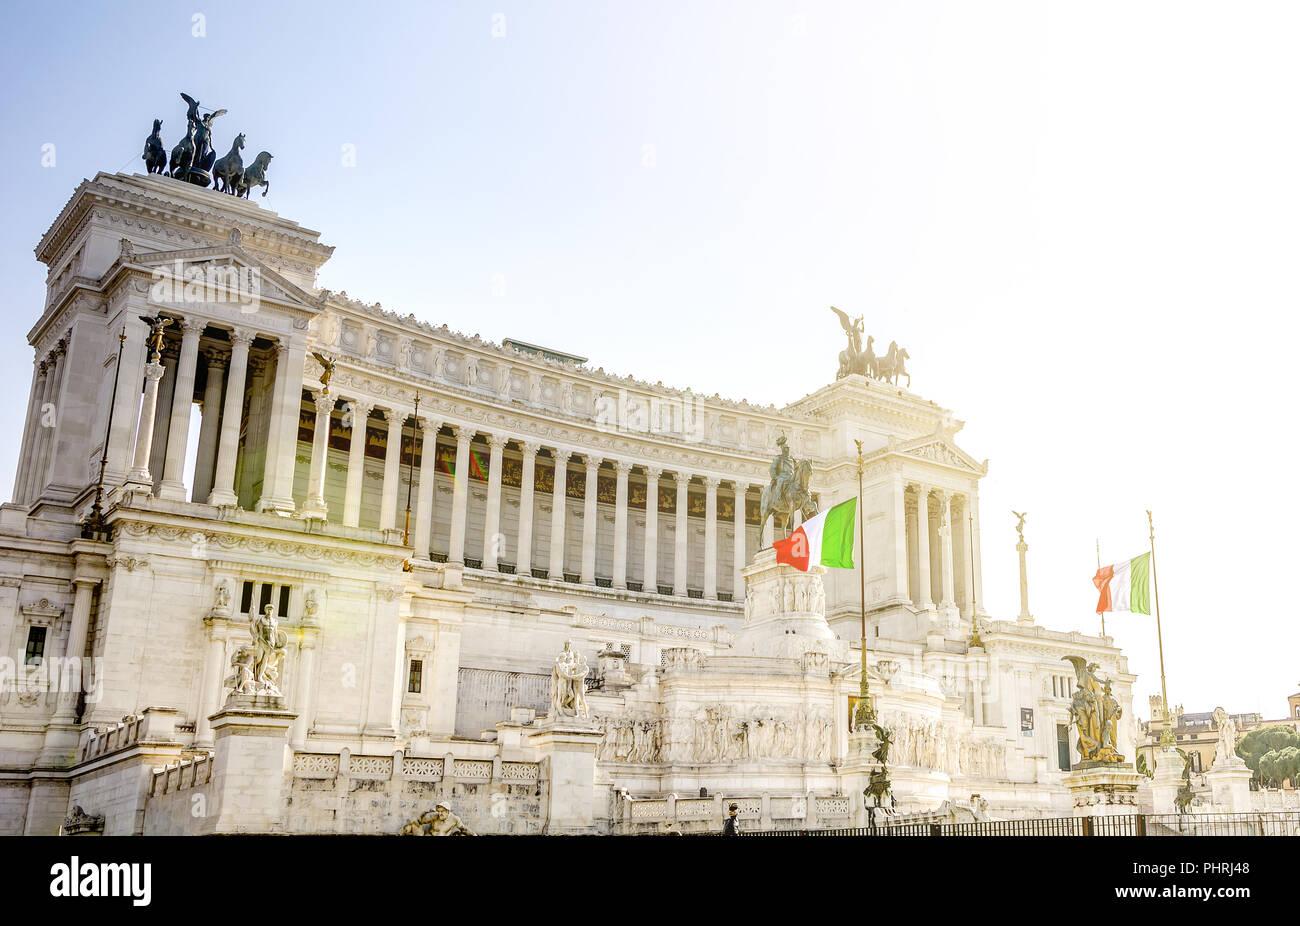 Le Vittoriano monument national italien à Rome Photo Stock